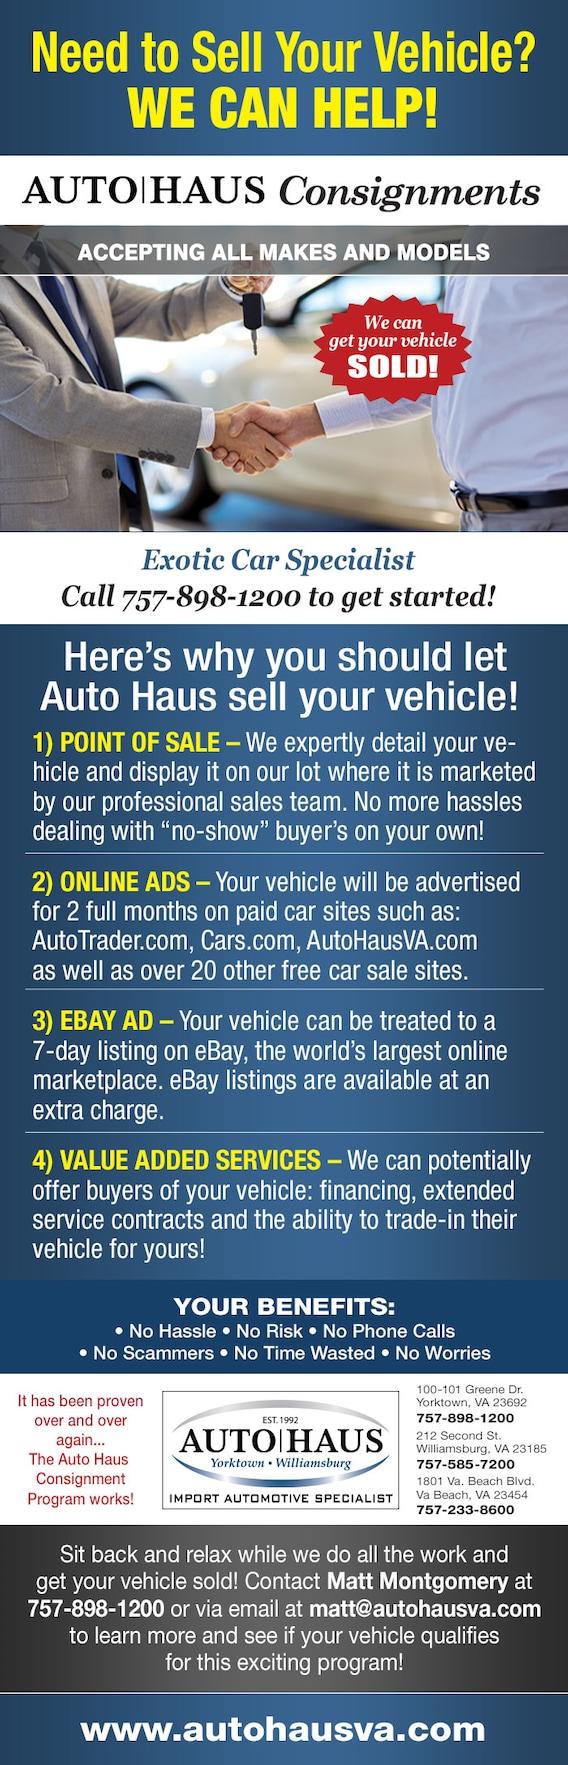 Auto Haus Consignments Auto Haus